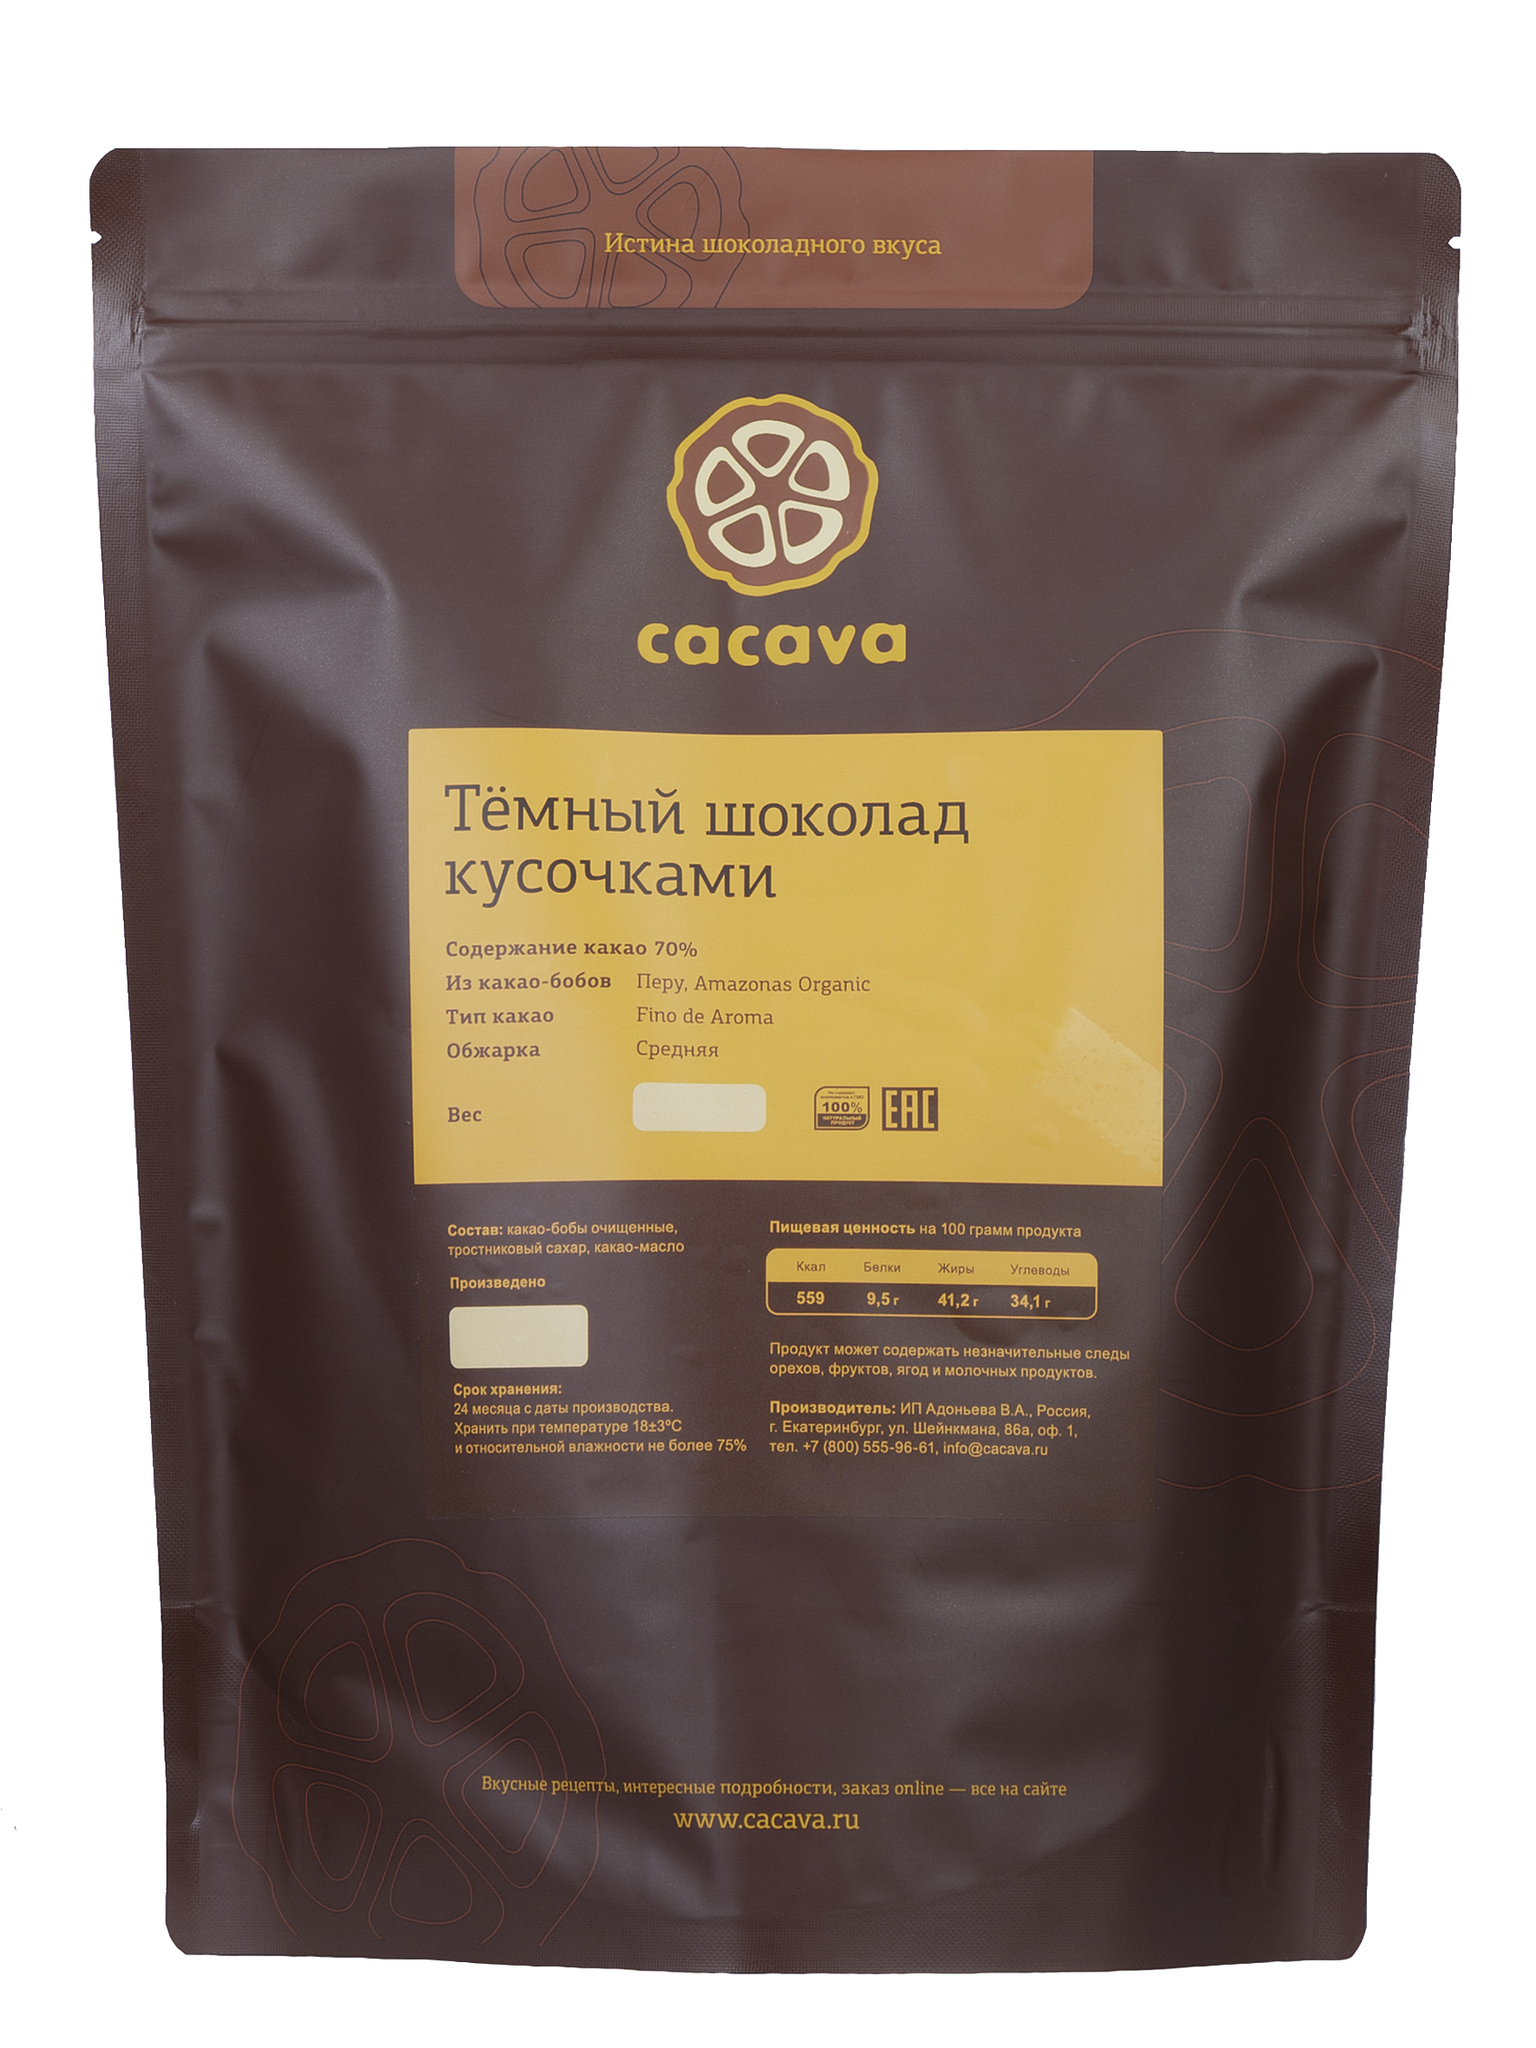 Тёмный шоколад 70 % какао (Перу, Amazonas), упаковка 1 кг